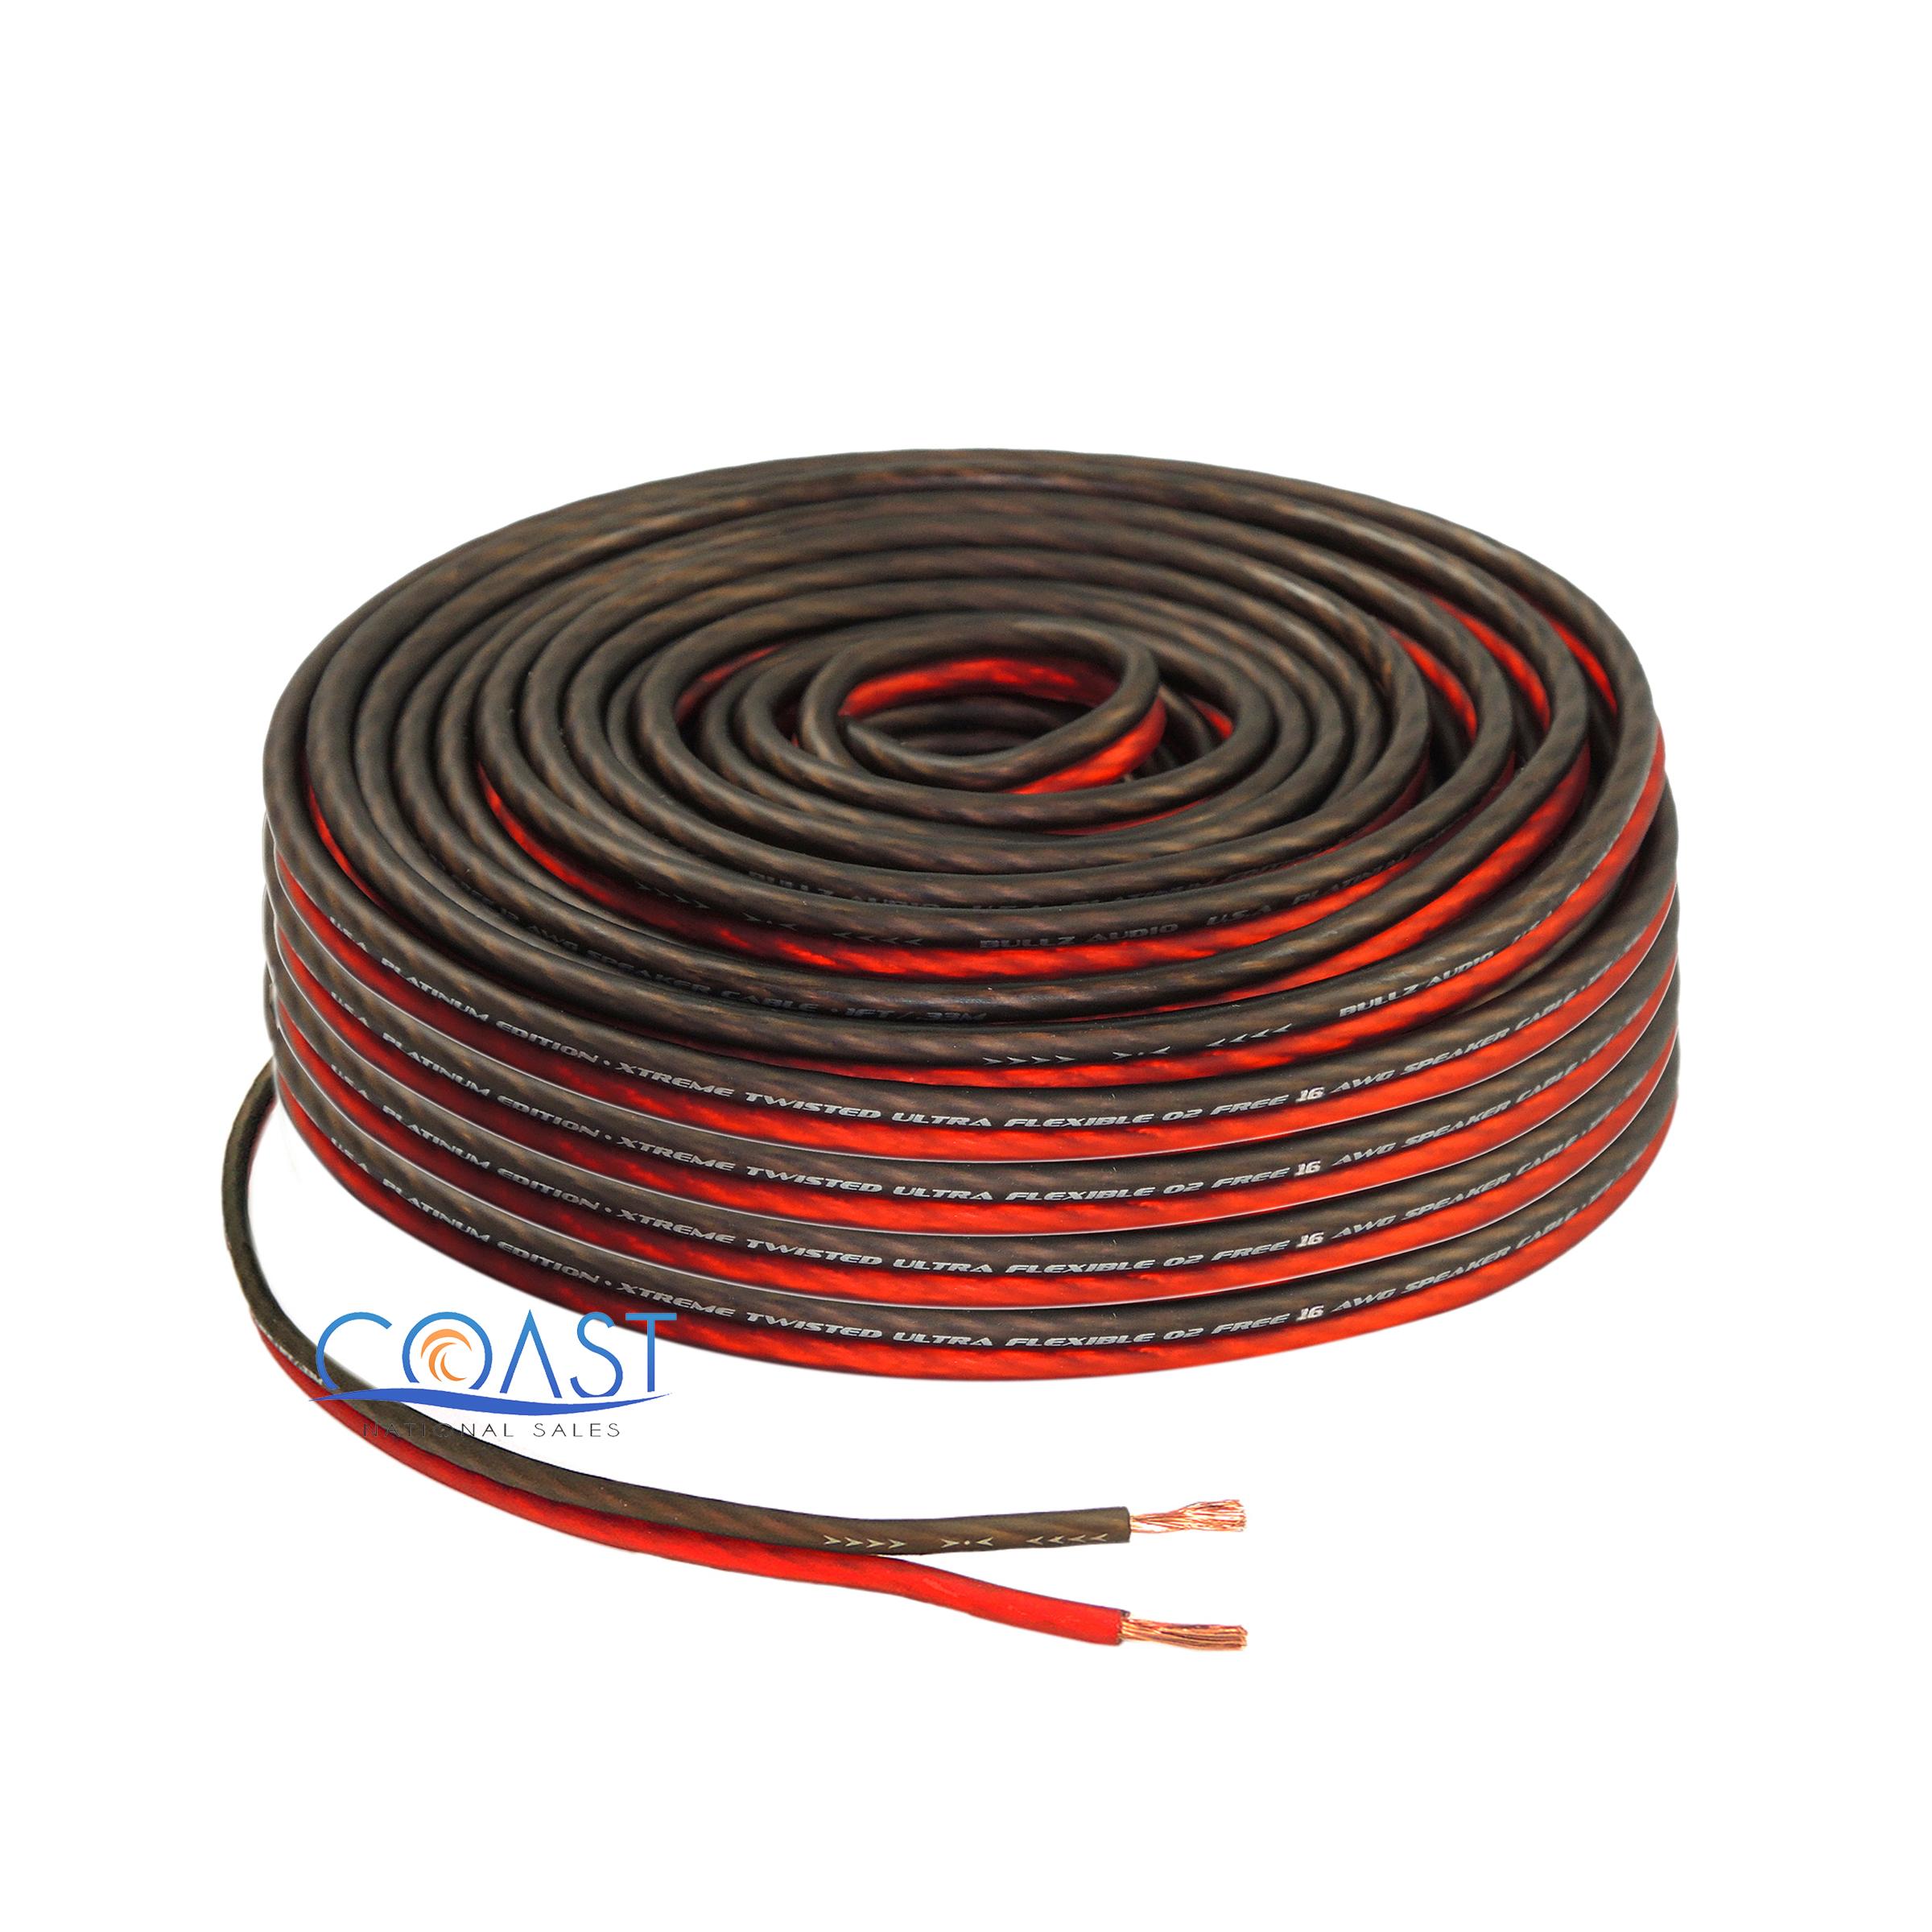 Home Speaker Wire Gauge : Red ft true gauge awg car home audio speaker wire